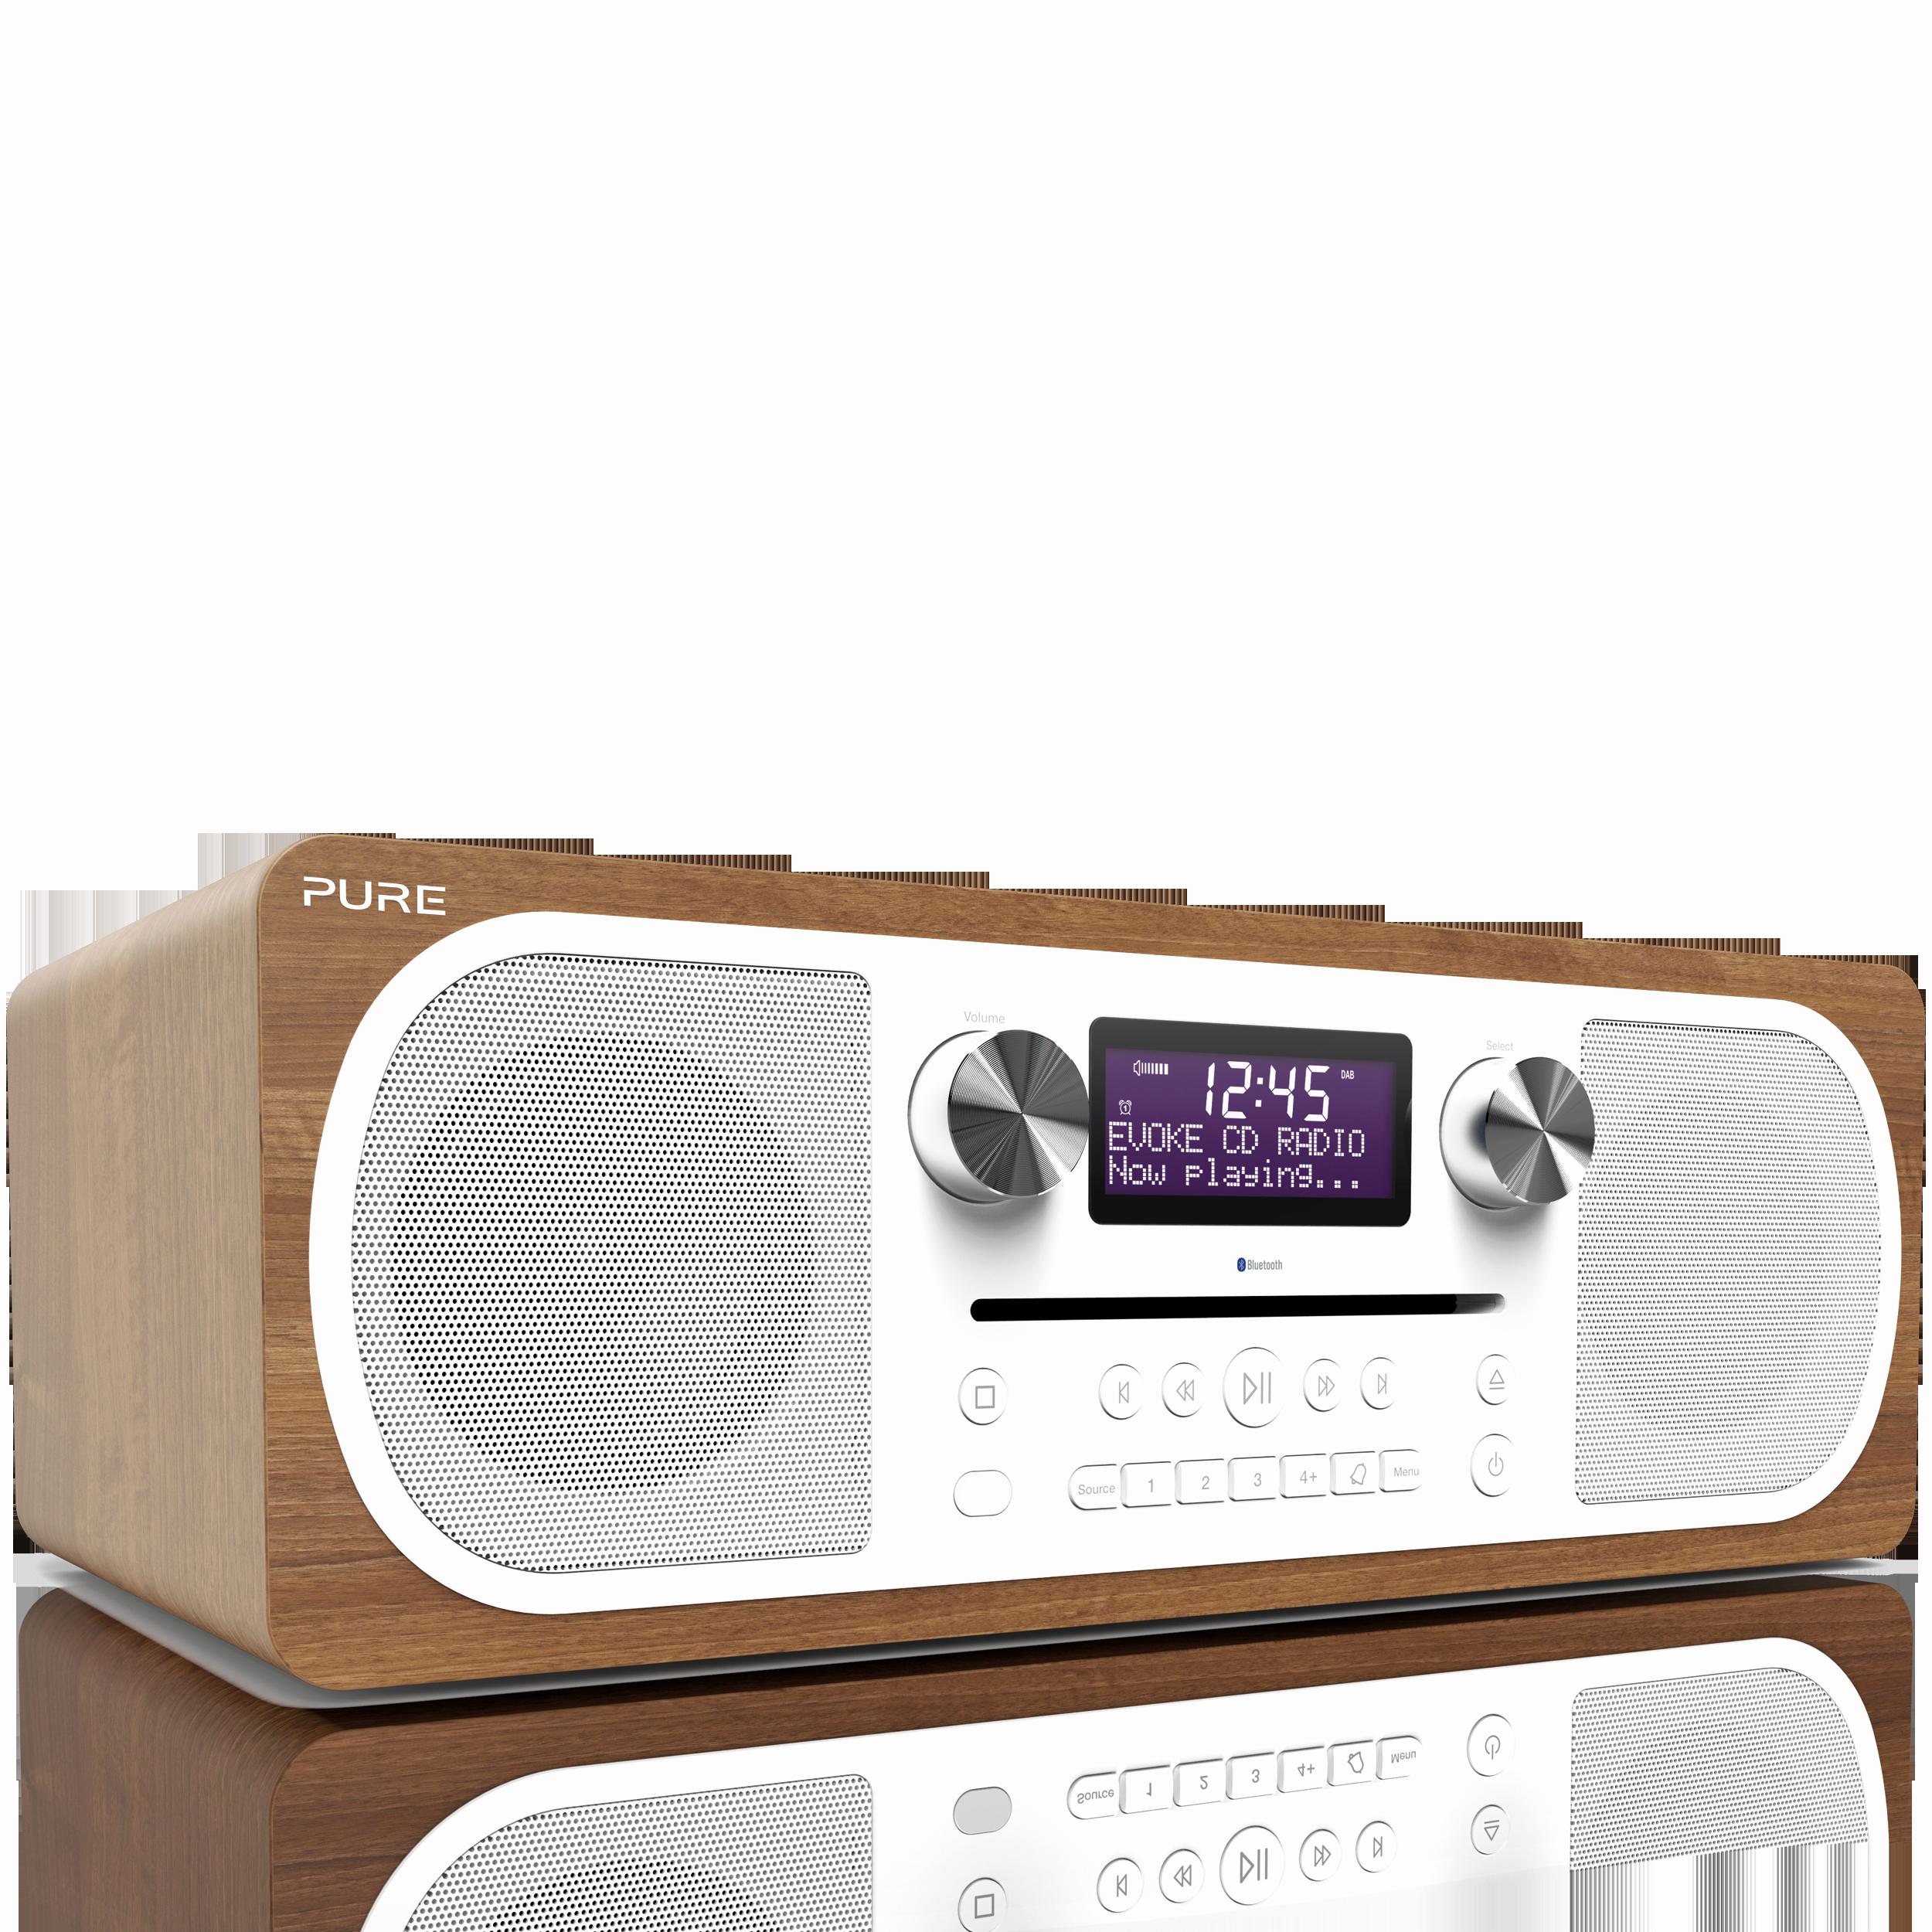 Radio Reveil Philips Darty Nouveau Collection Darty Chauffage D Appoint Frais Radio Reveil Bois Blanc Darty